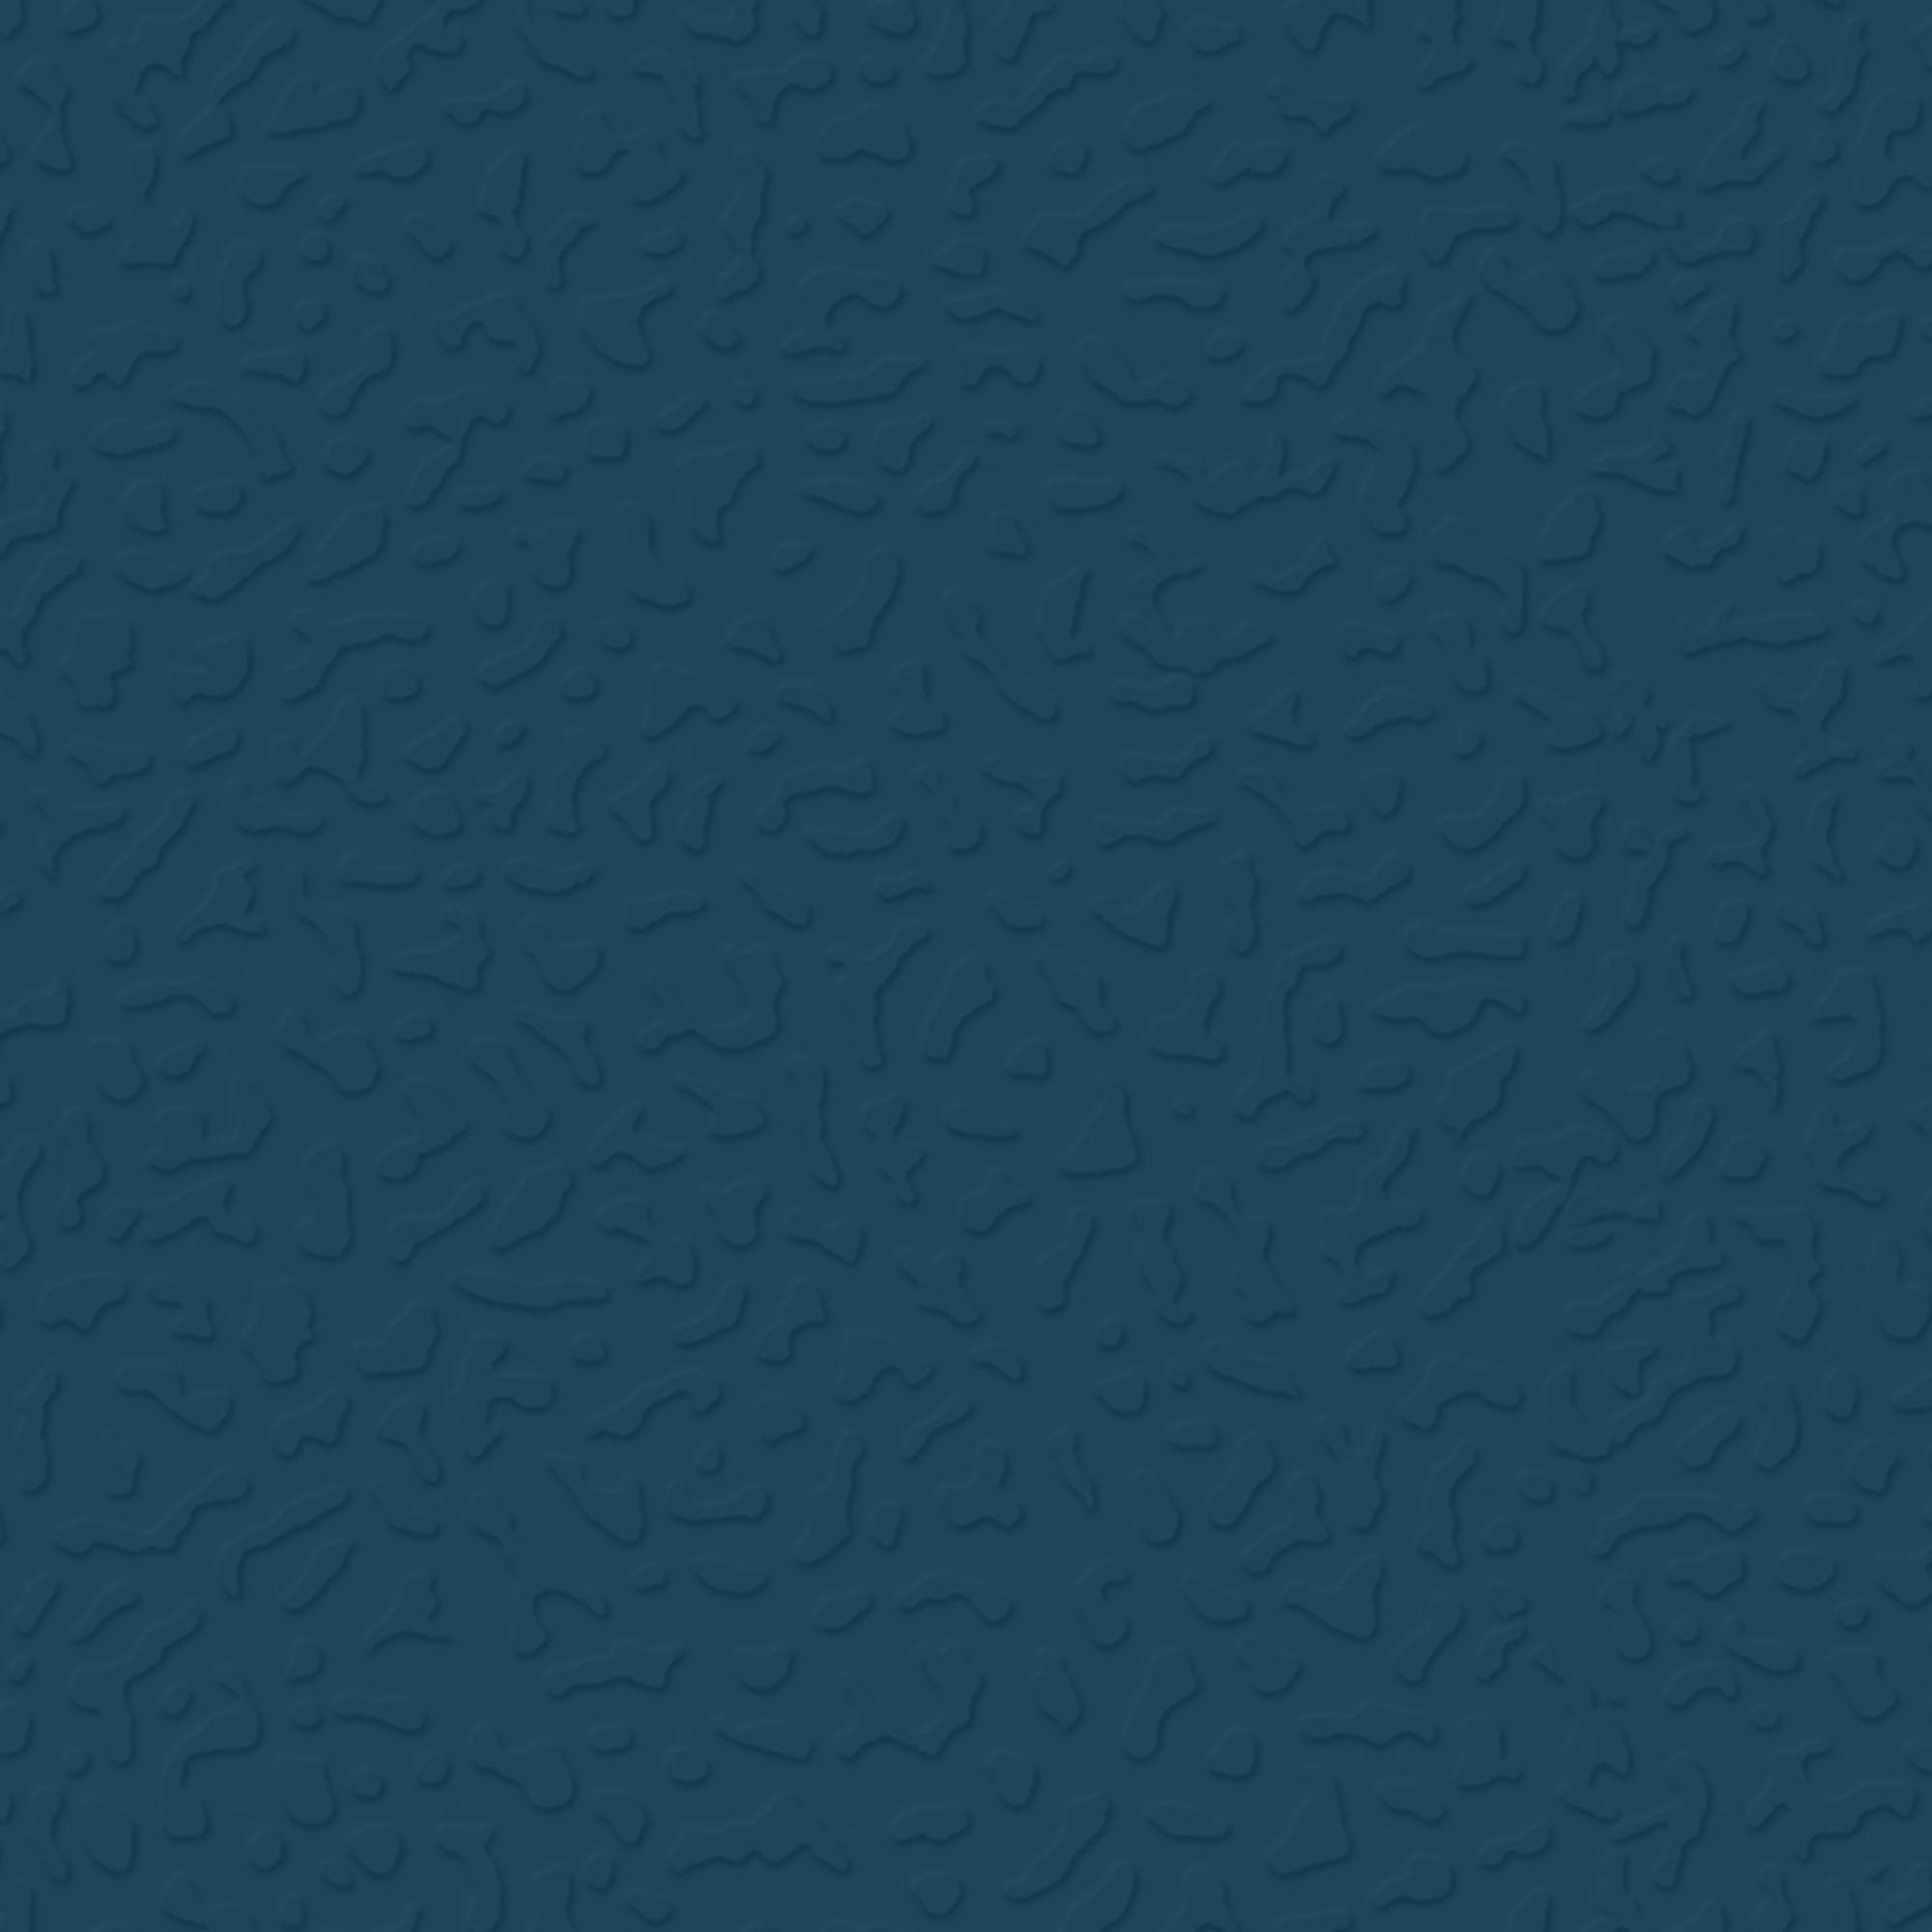 Roppe Rubber Tile 900 - Textured Design (993) Blue Rubber Flooring